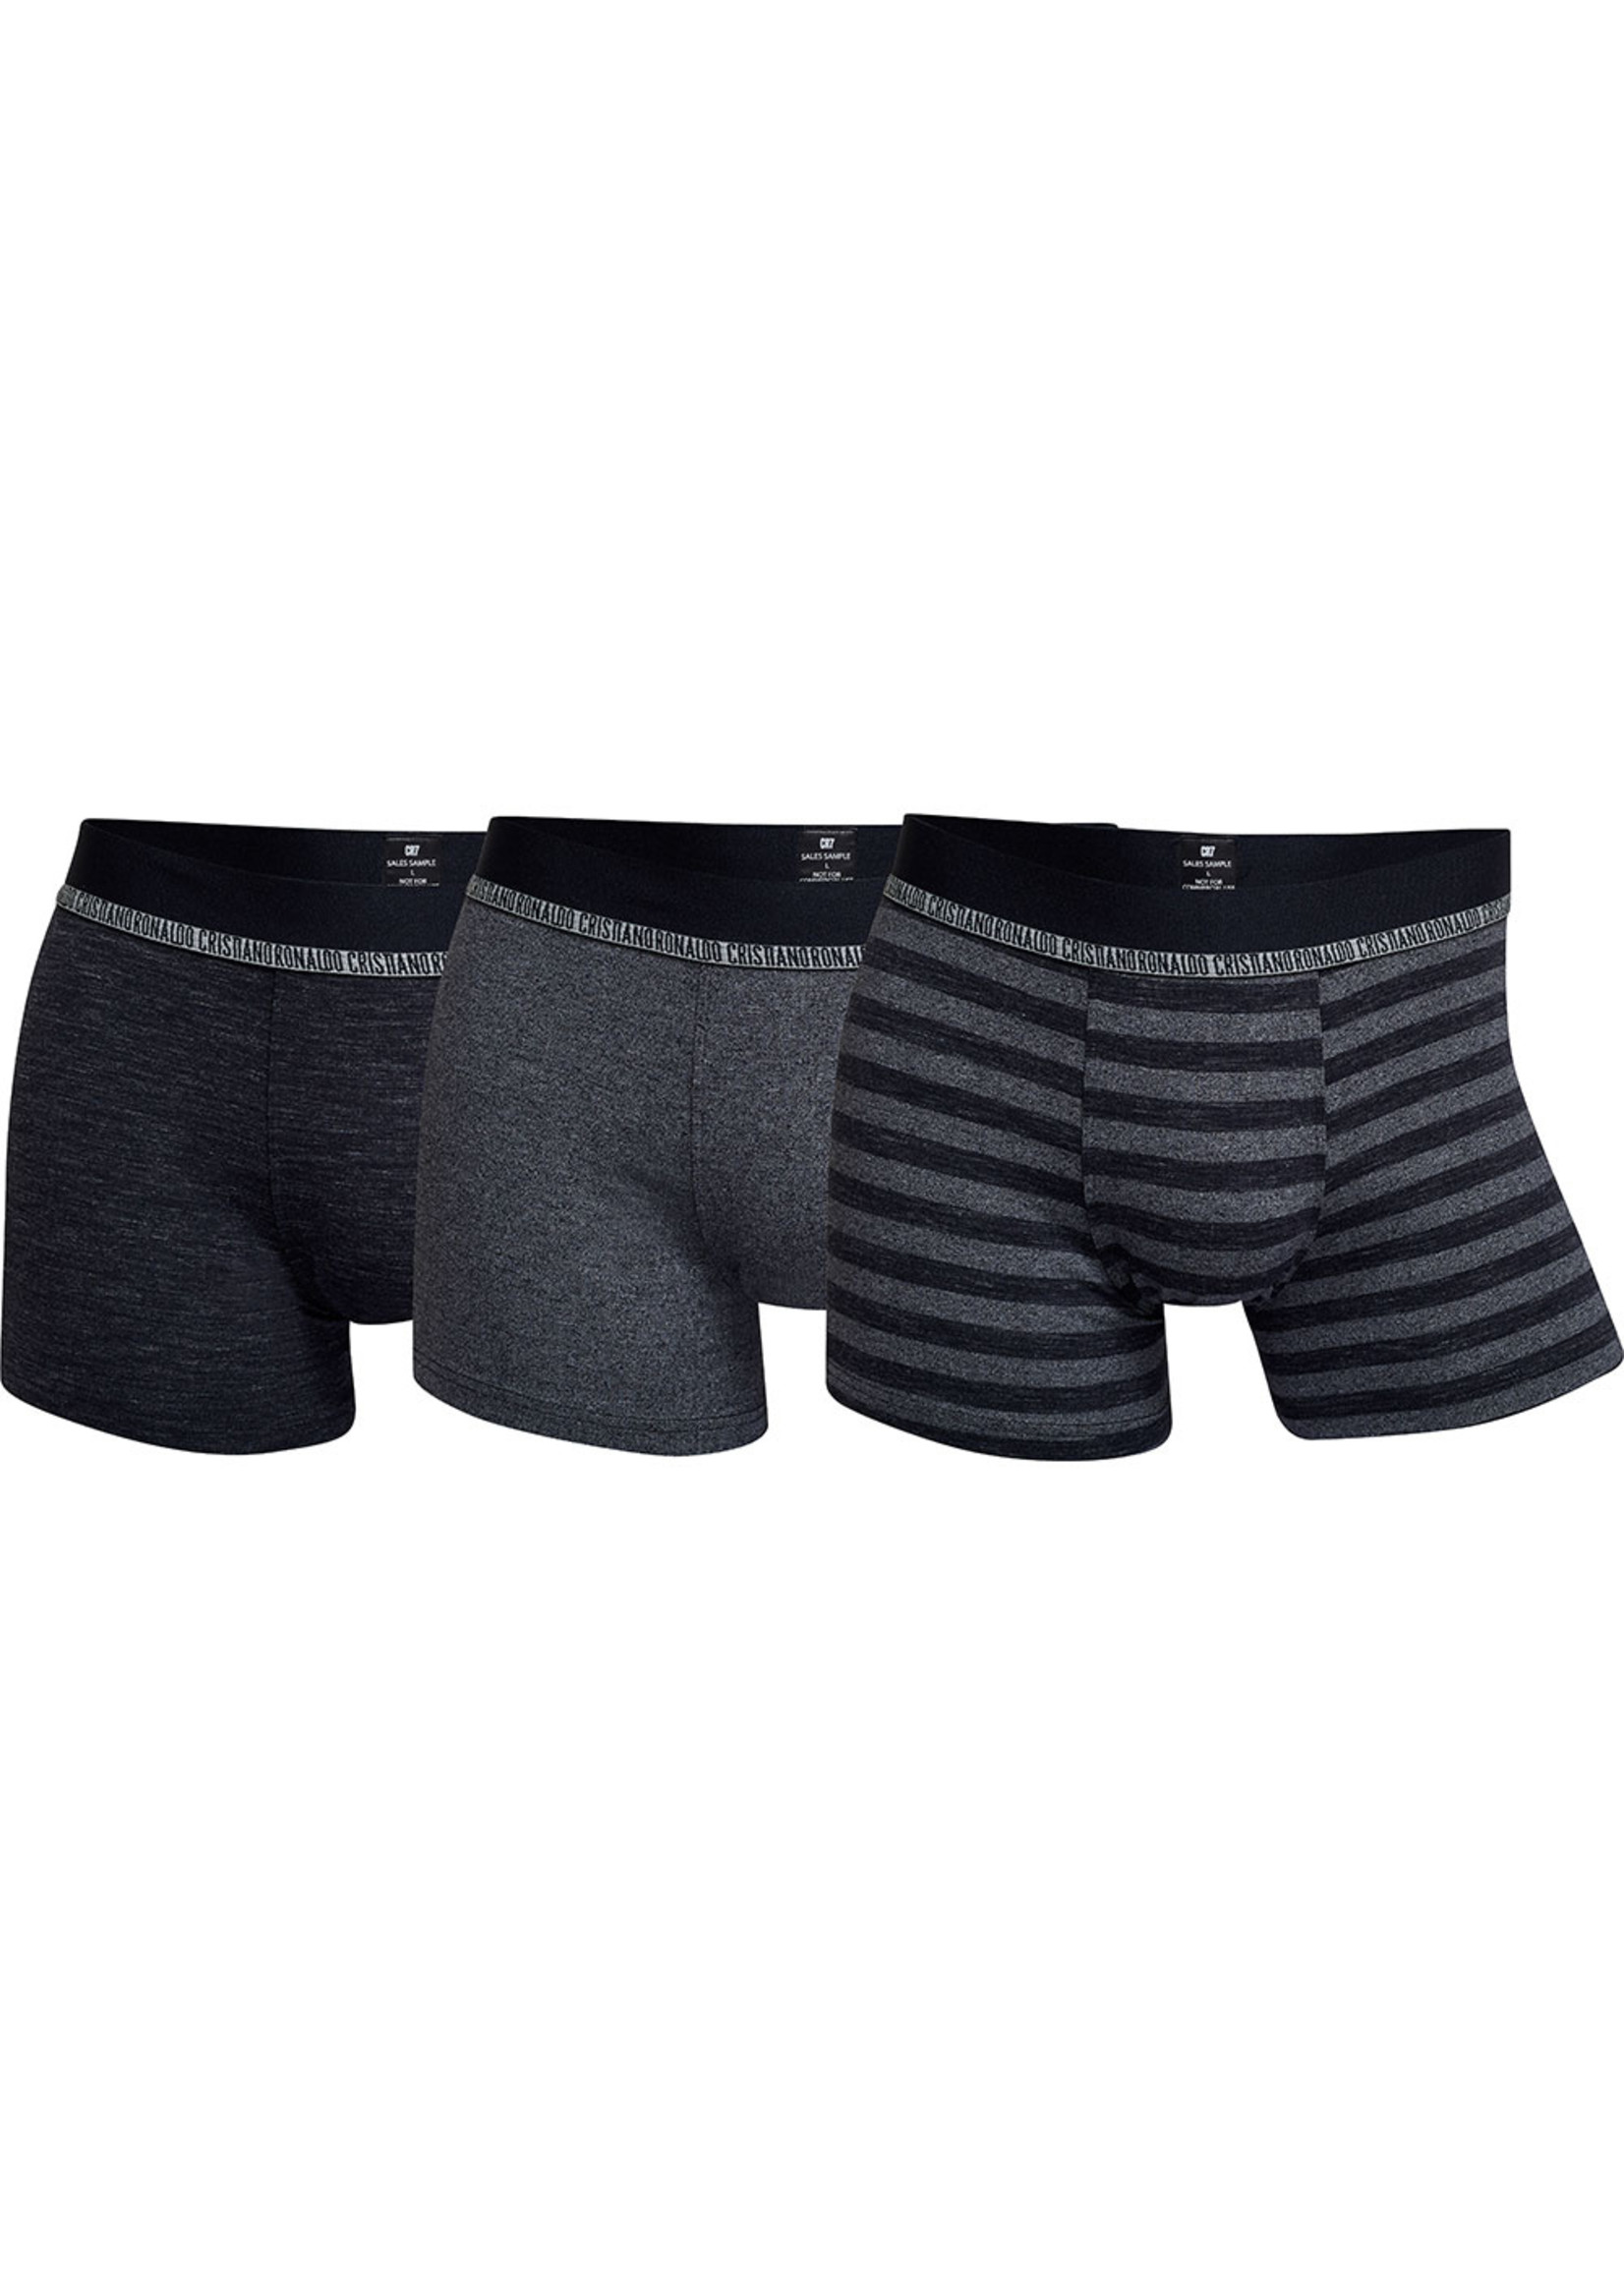 CR7 Soft Bamboo Luxury Trunk Underwear - 3 pack